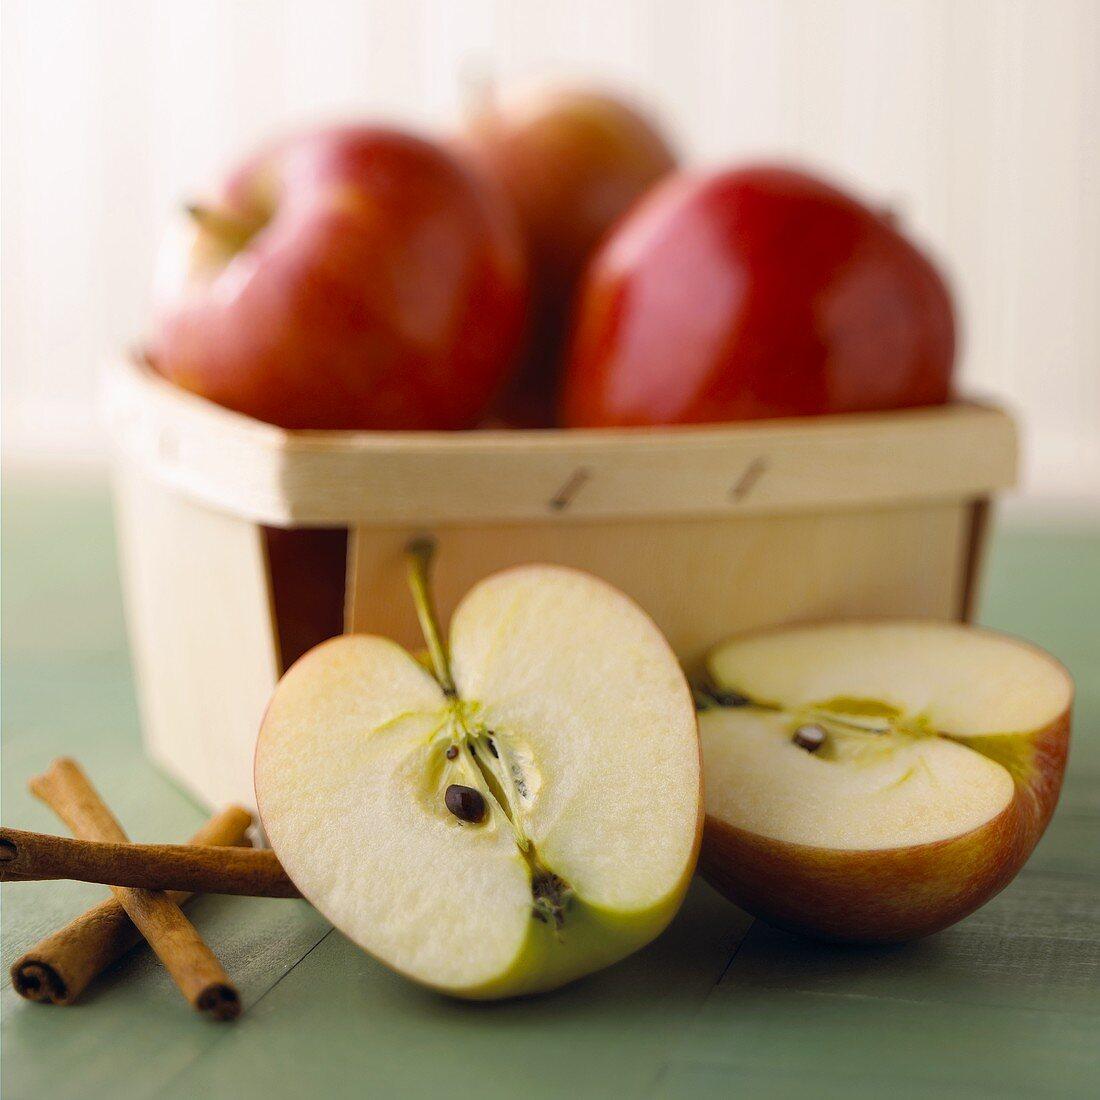 Apples in punnet, two apple halves & cinnamon sticks in front